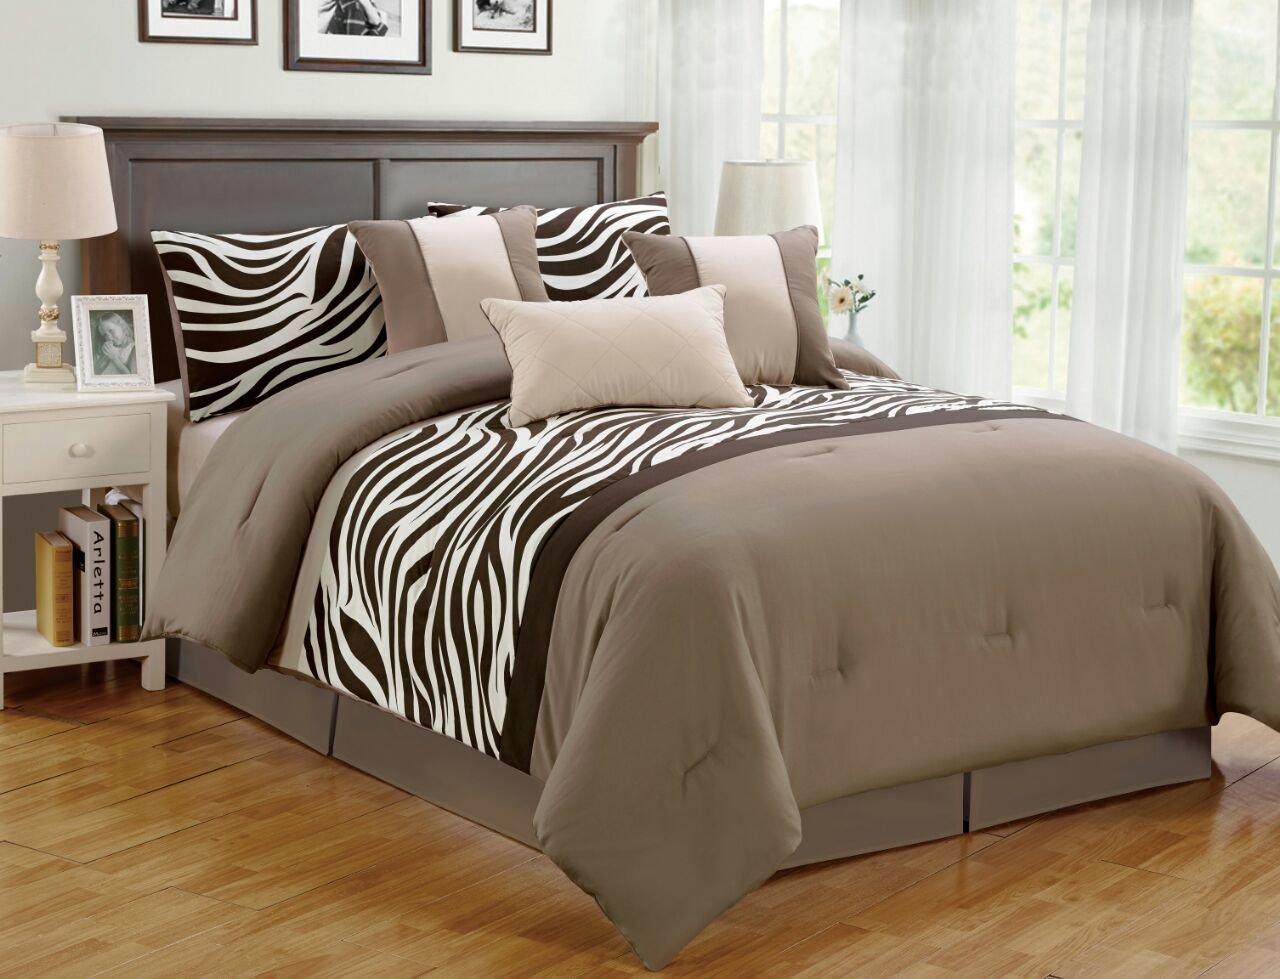 7 Pieces Comforter Set Bed Bag Oversize Zebra Animal